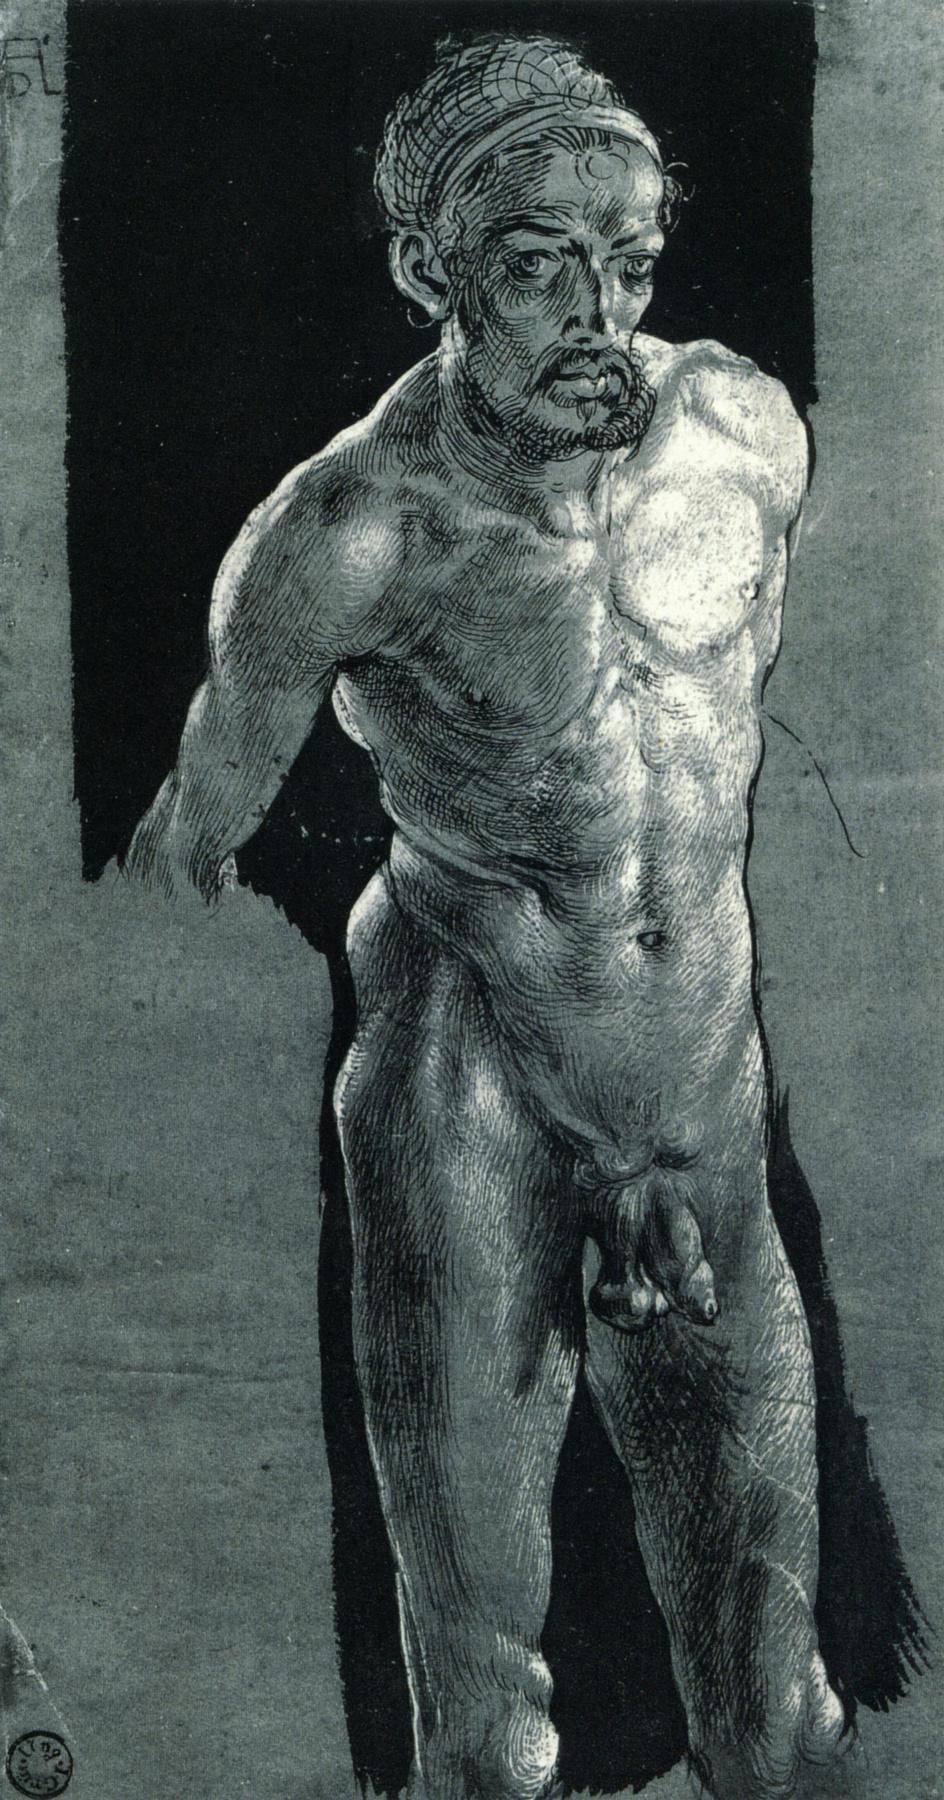 Albrecht Dürer. Self-portrait in the Nude